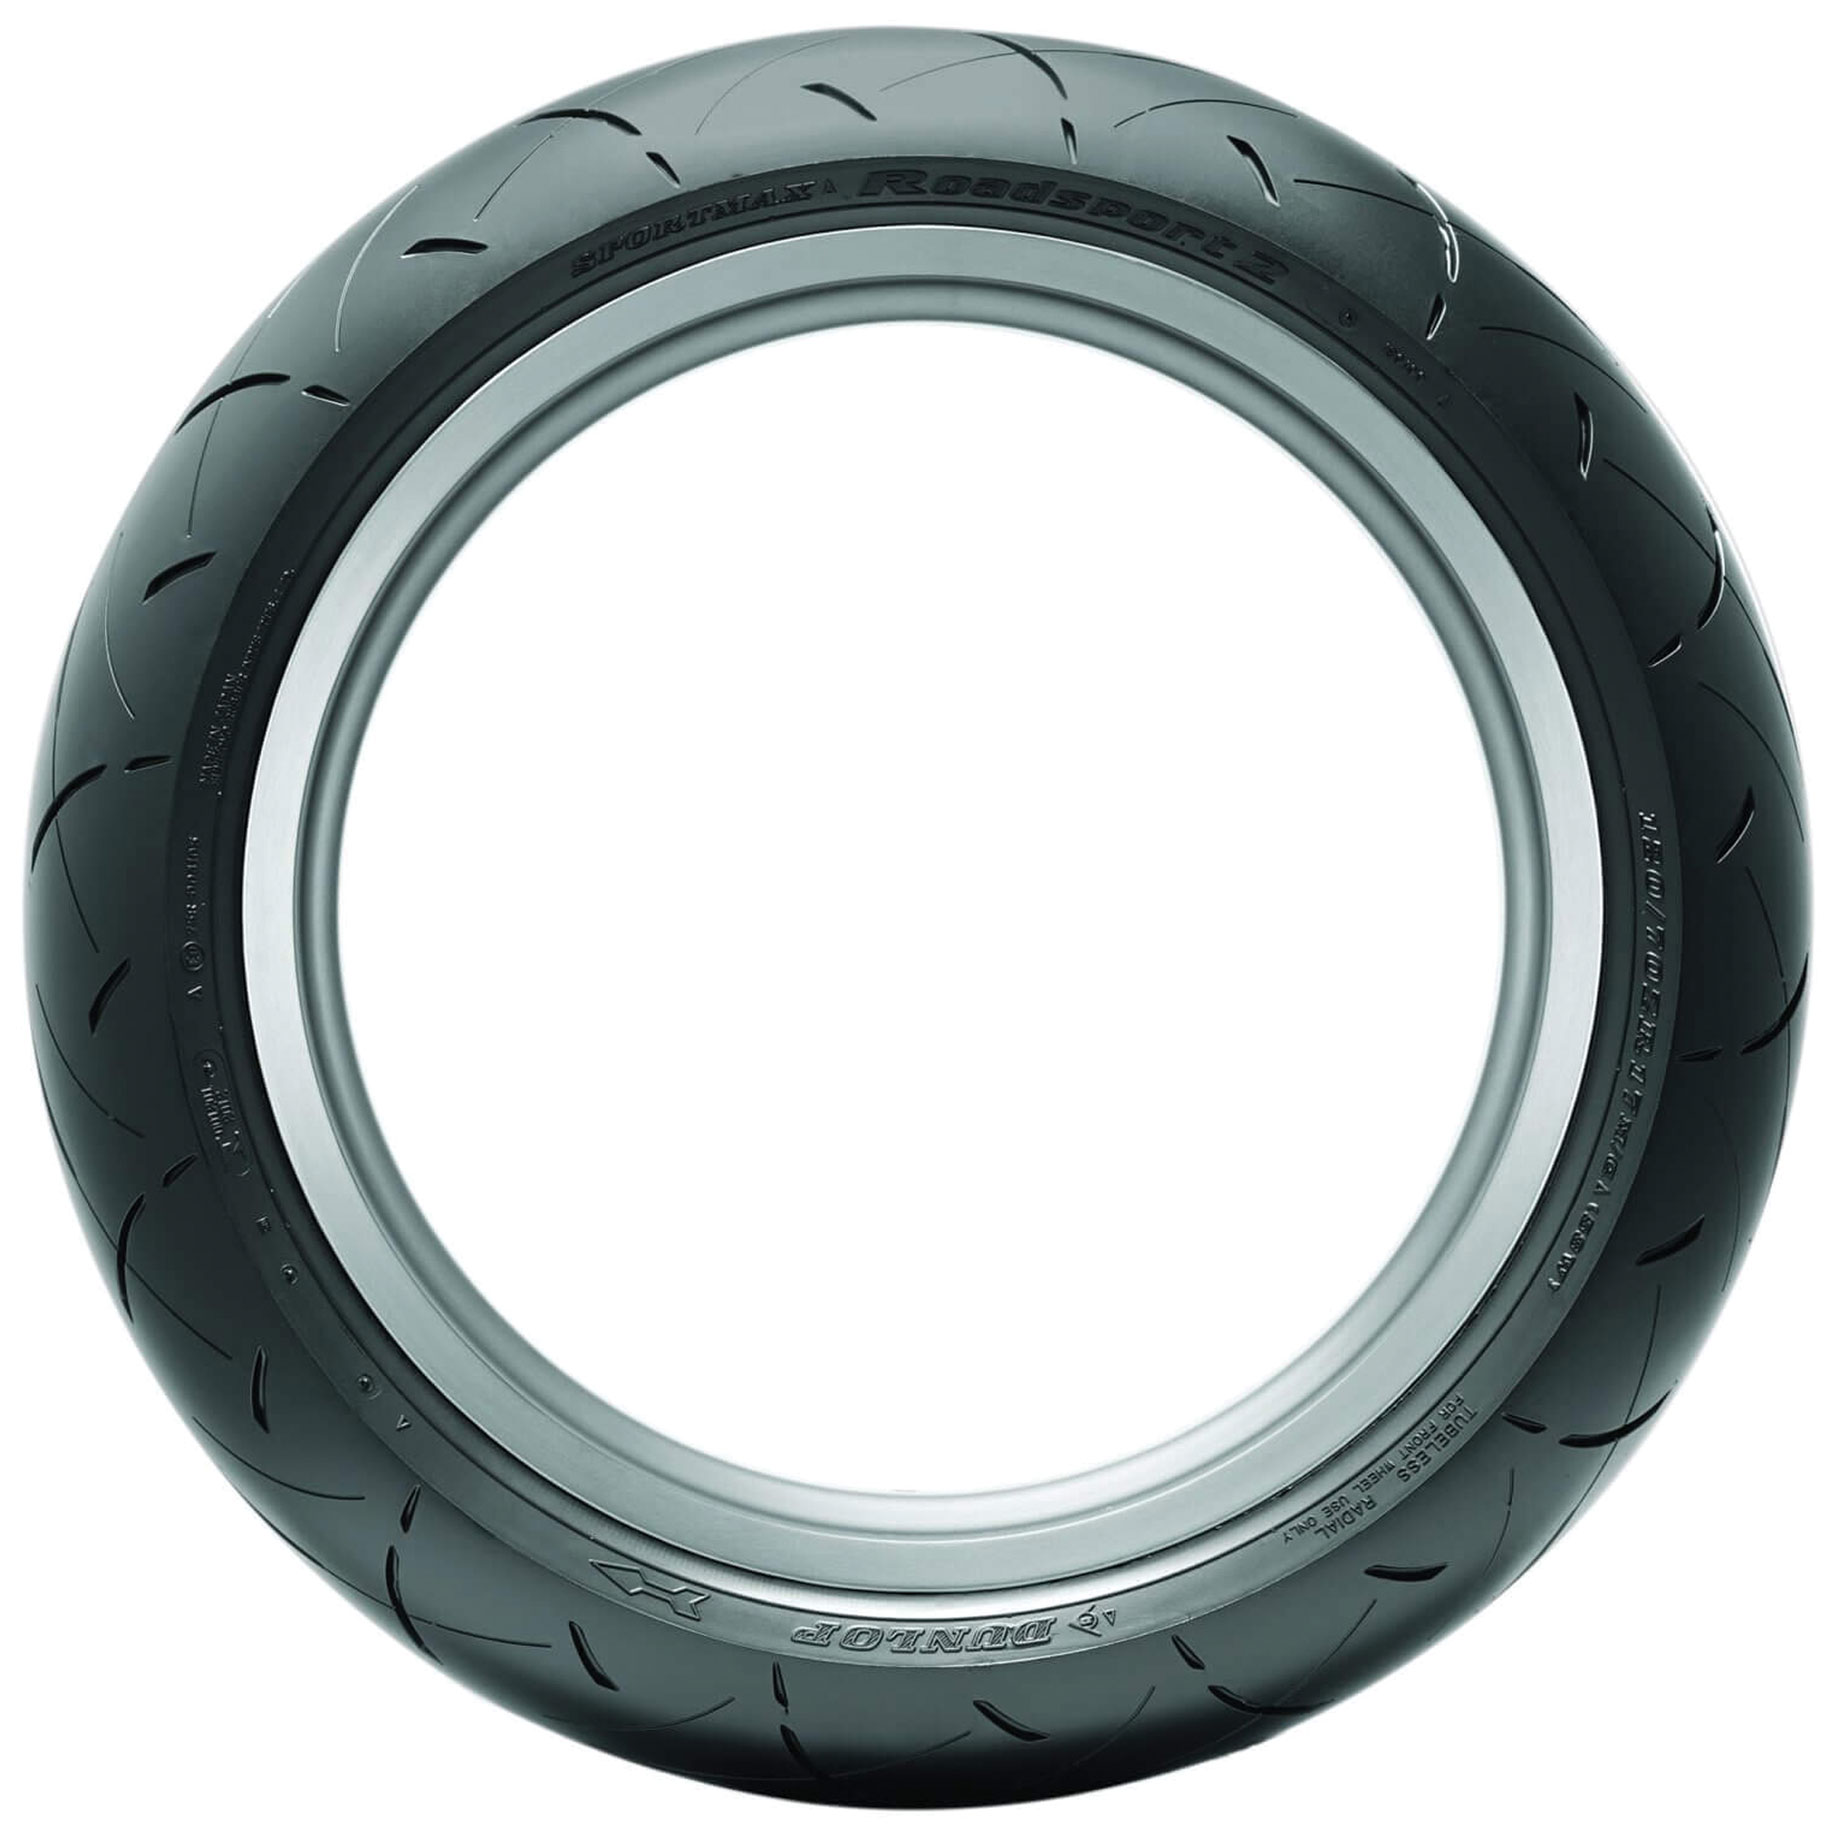 120//70ZR-18 Dunlop Roadsmart ll Sport Touring Radial Front Tire